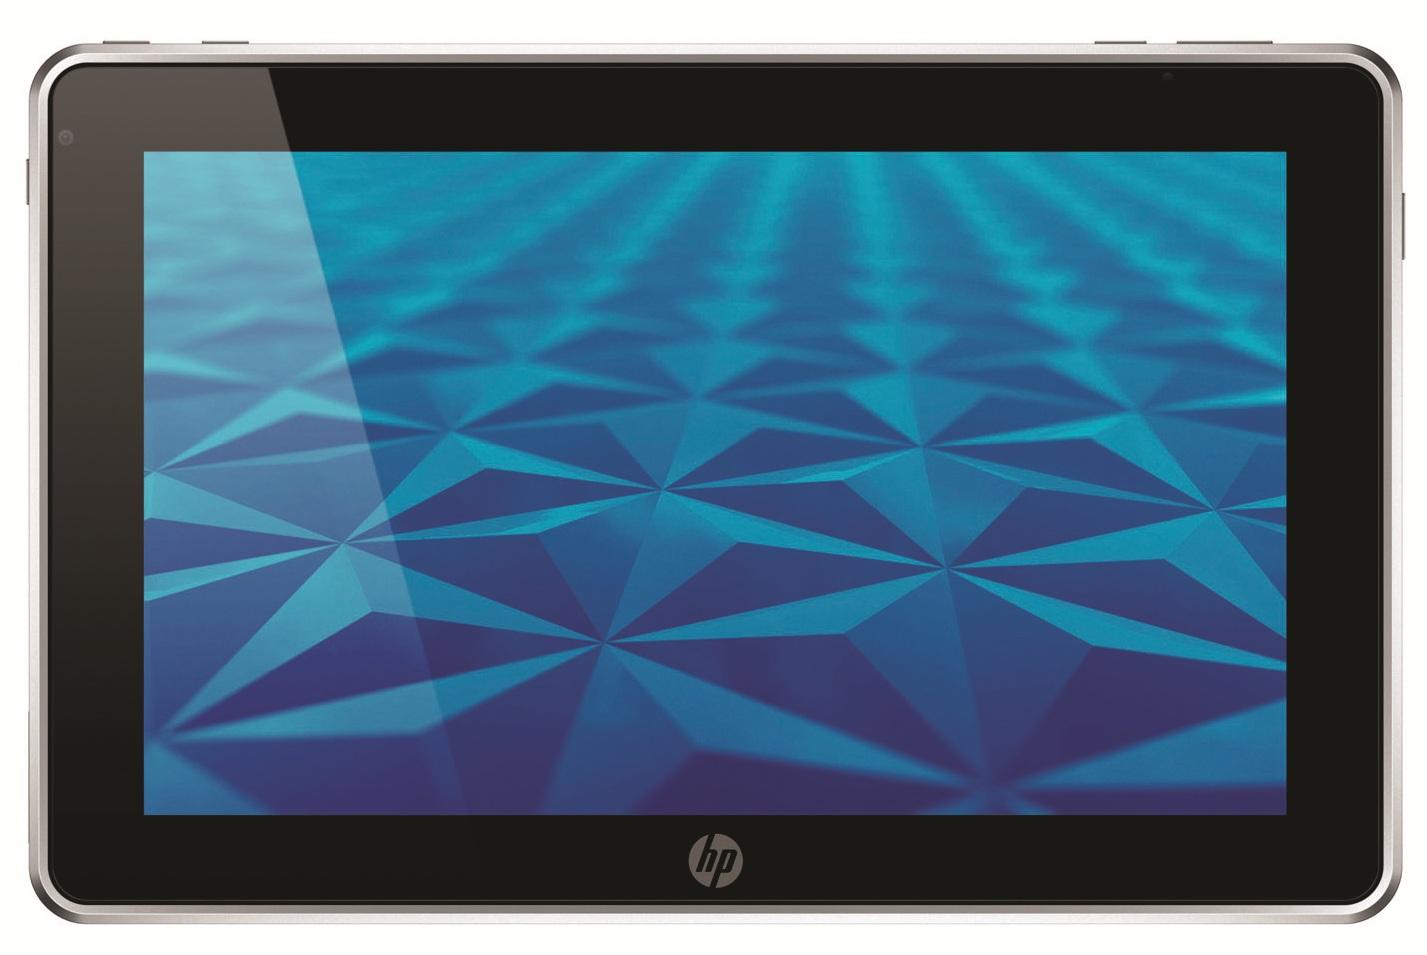 HP G72-b63NR Notebook Broadcom Bluetooth Windows 8 X64 Driver Download